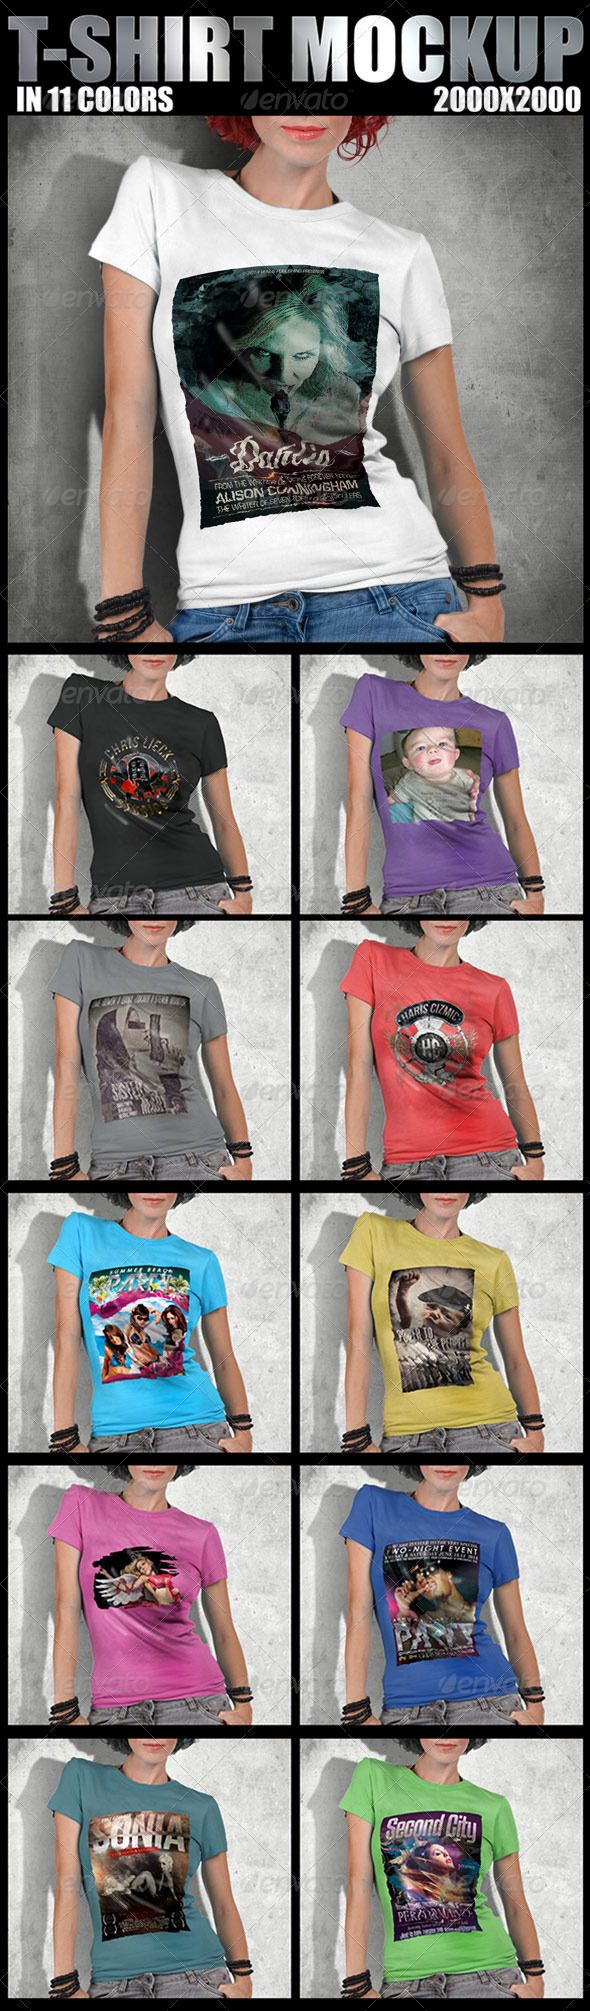 Scalable t shirt mockups more info - T Shirt Mockup Design